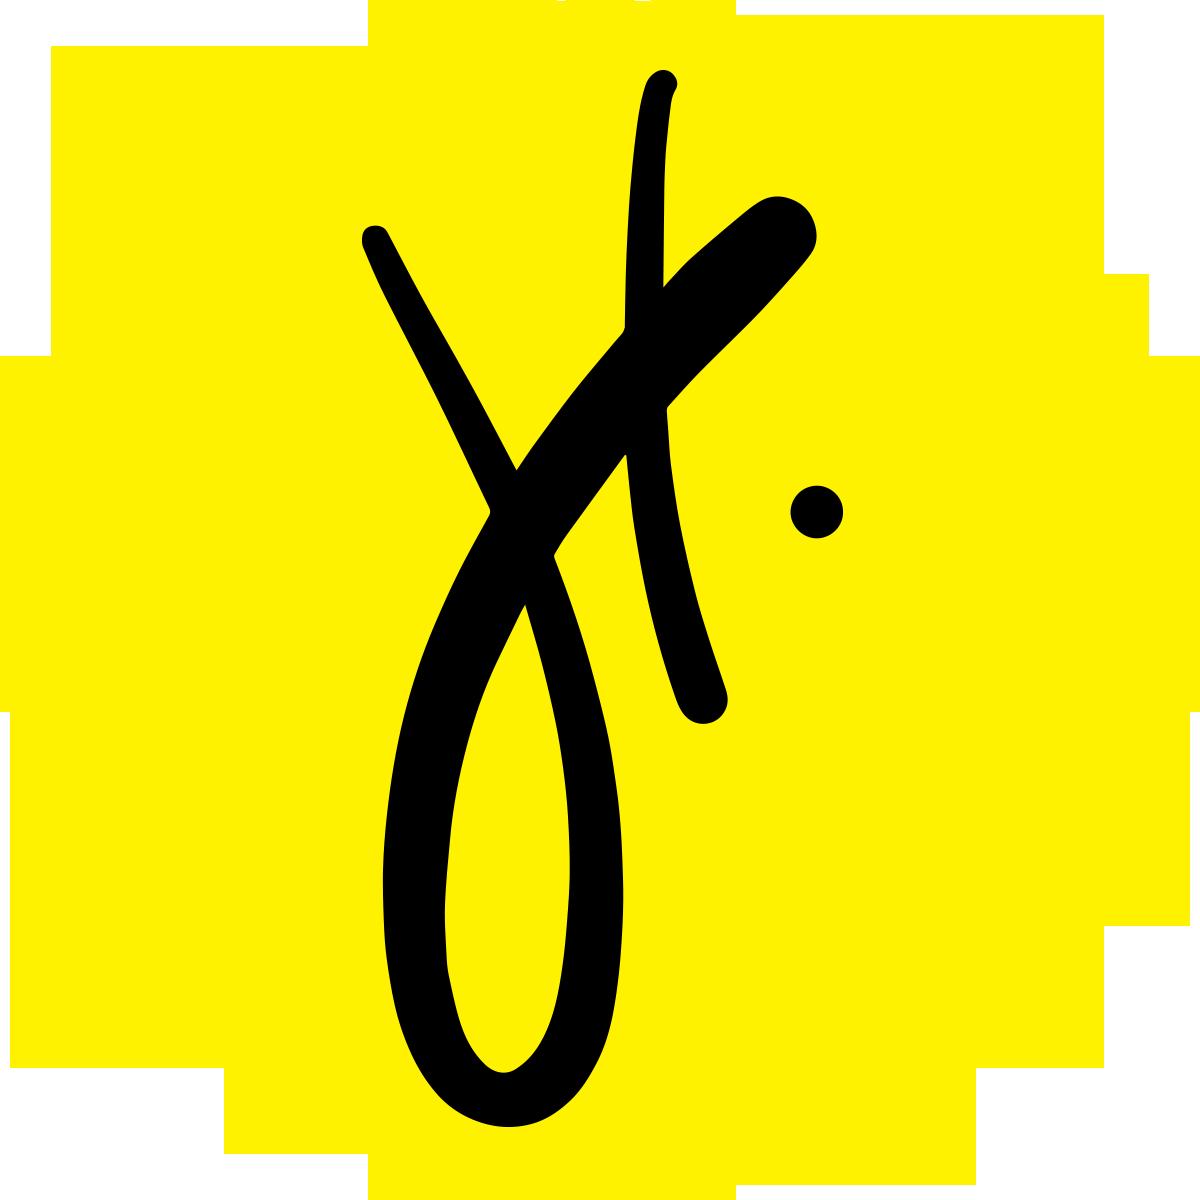 https://www.javierfischer.com/wp-content/uploads/2019/11/javierfischer-logo-2019.png